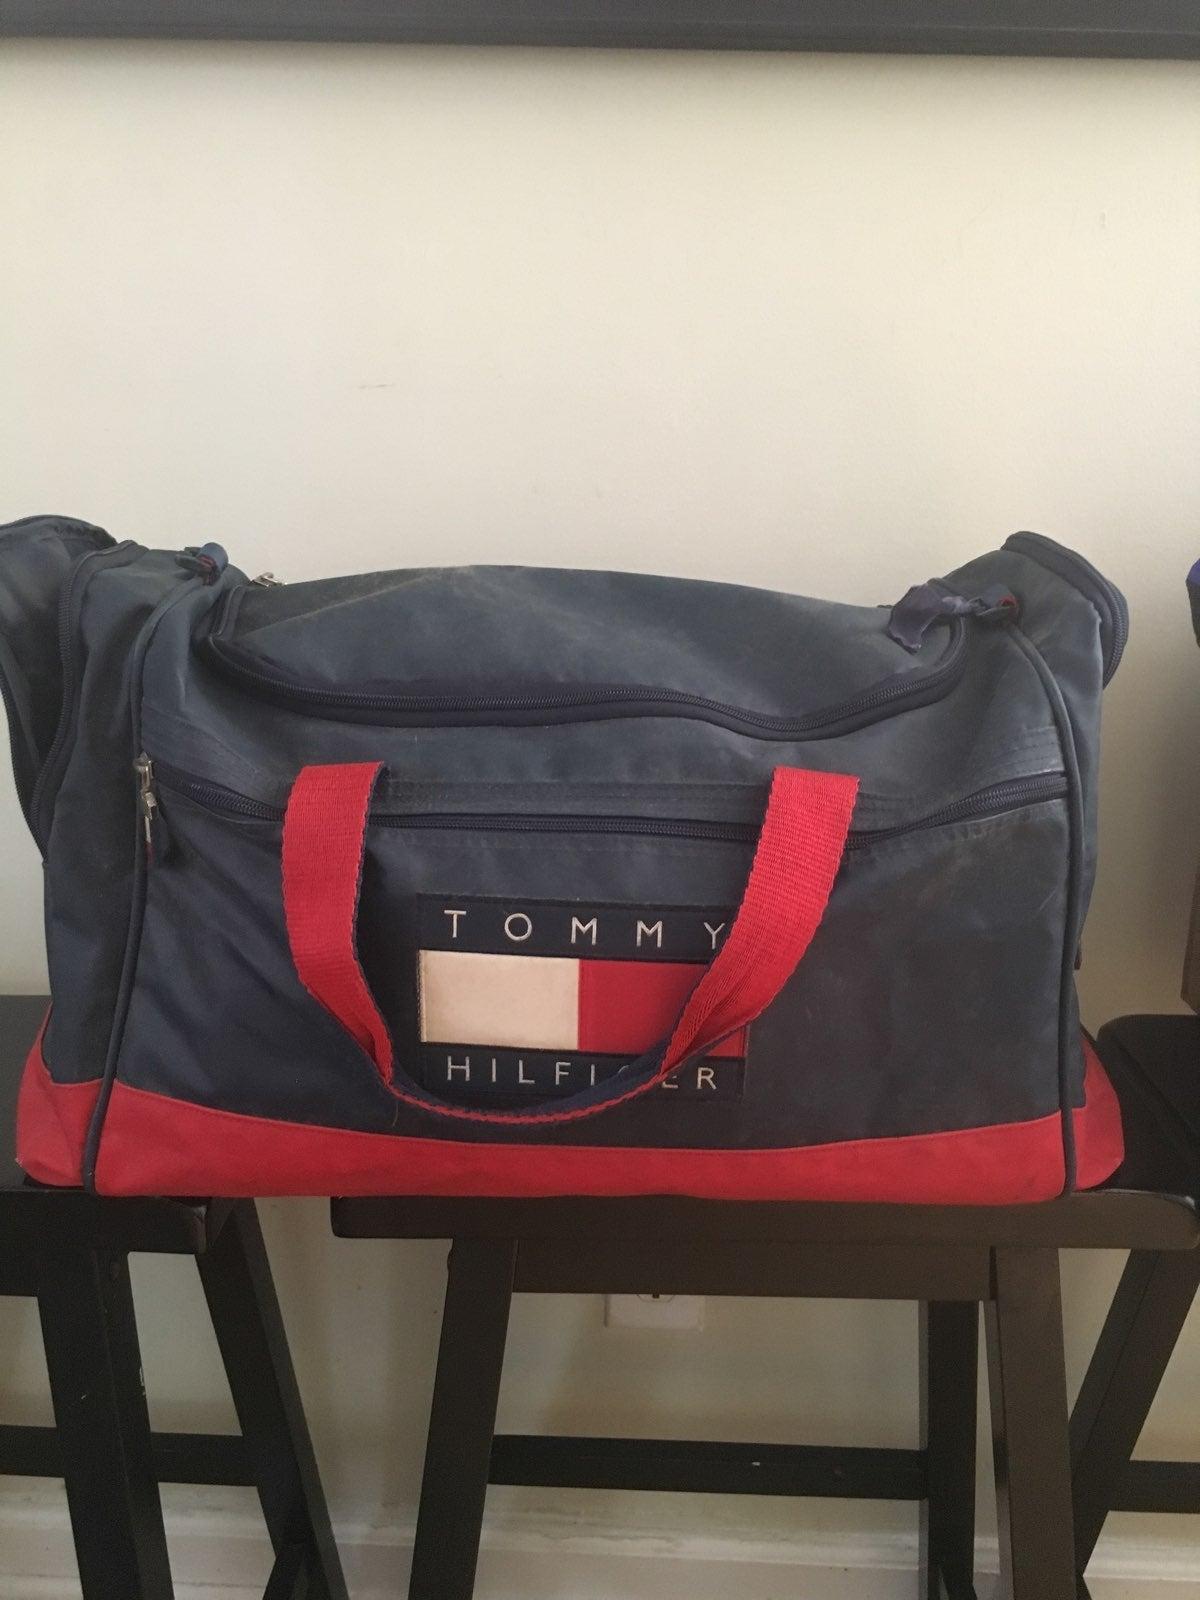 Tommy Hilfiger Big Patch Duffle Bag